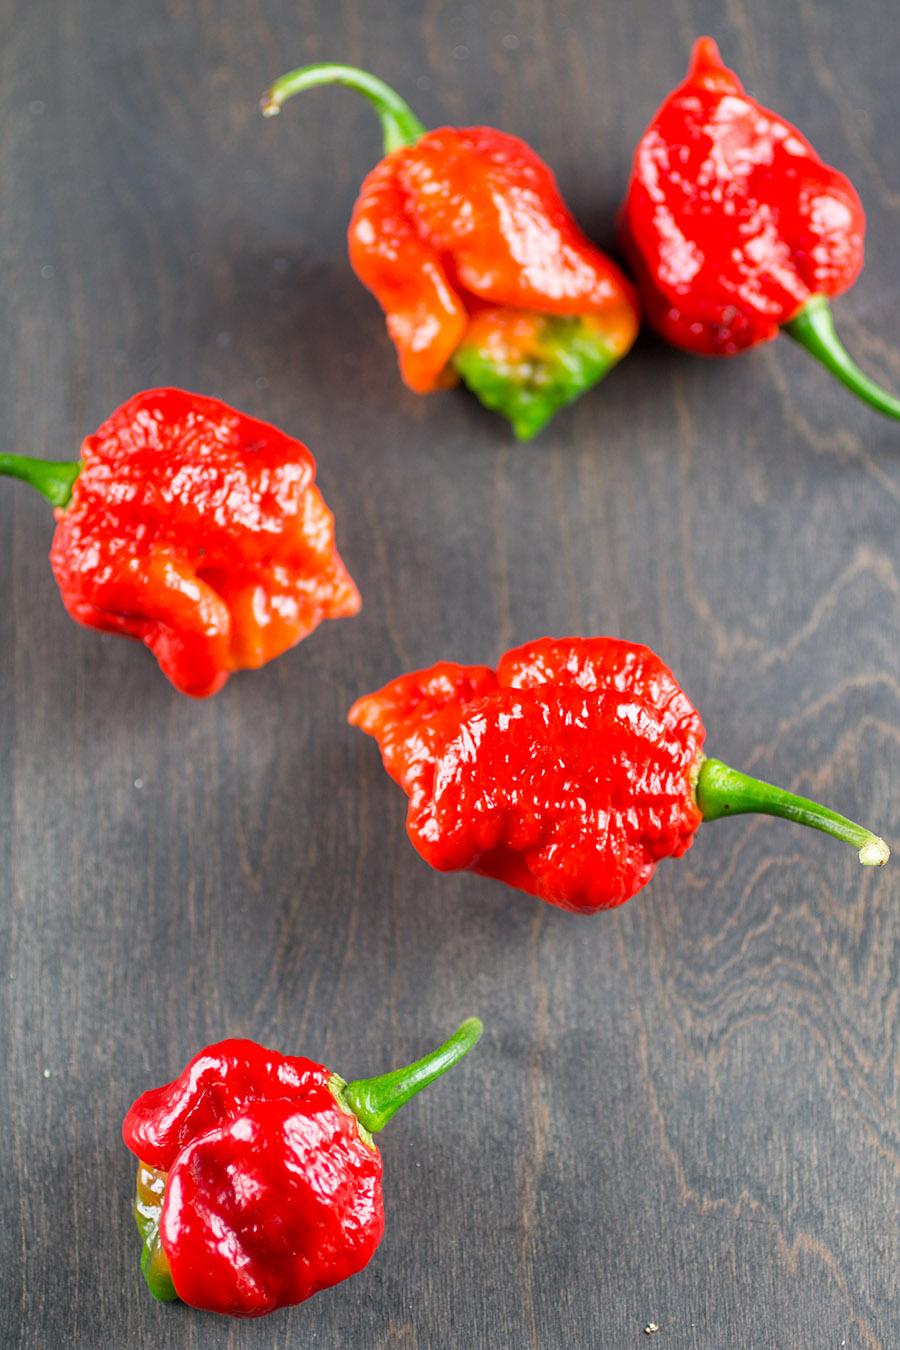 7 Pot Barrackapore Chili Pepper